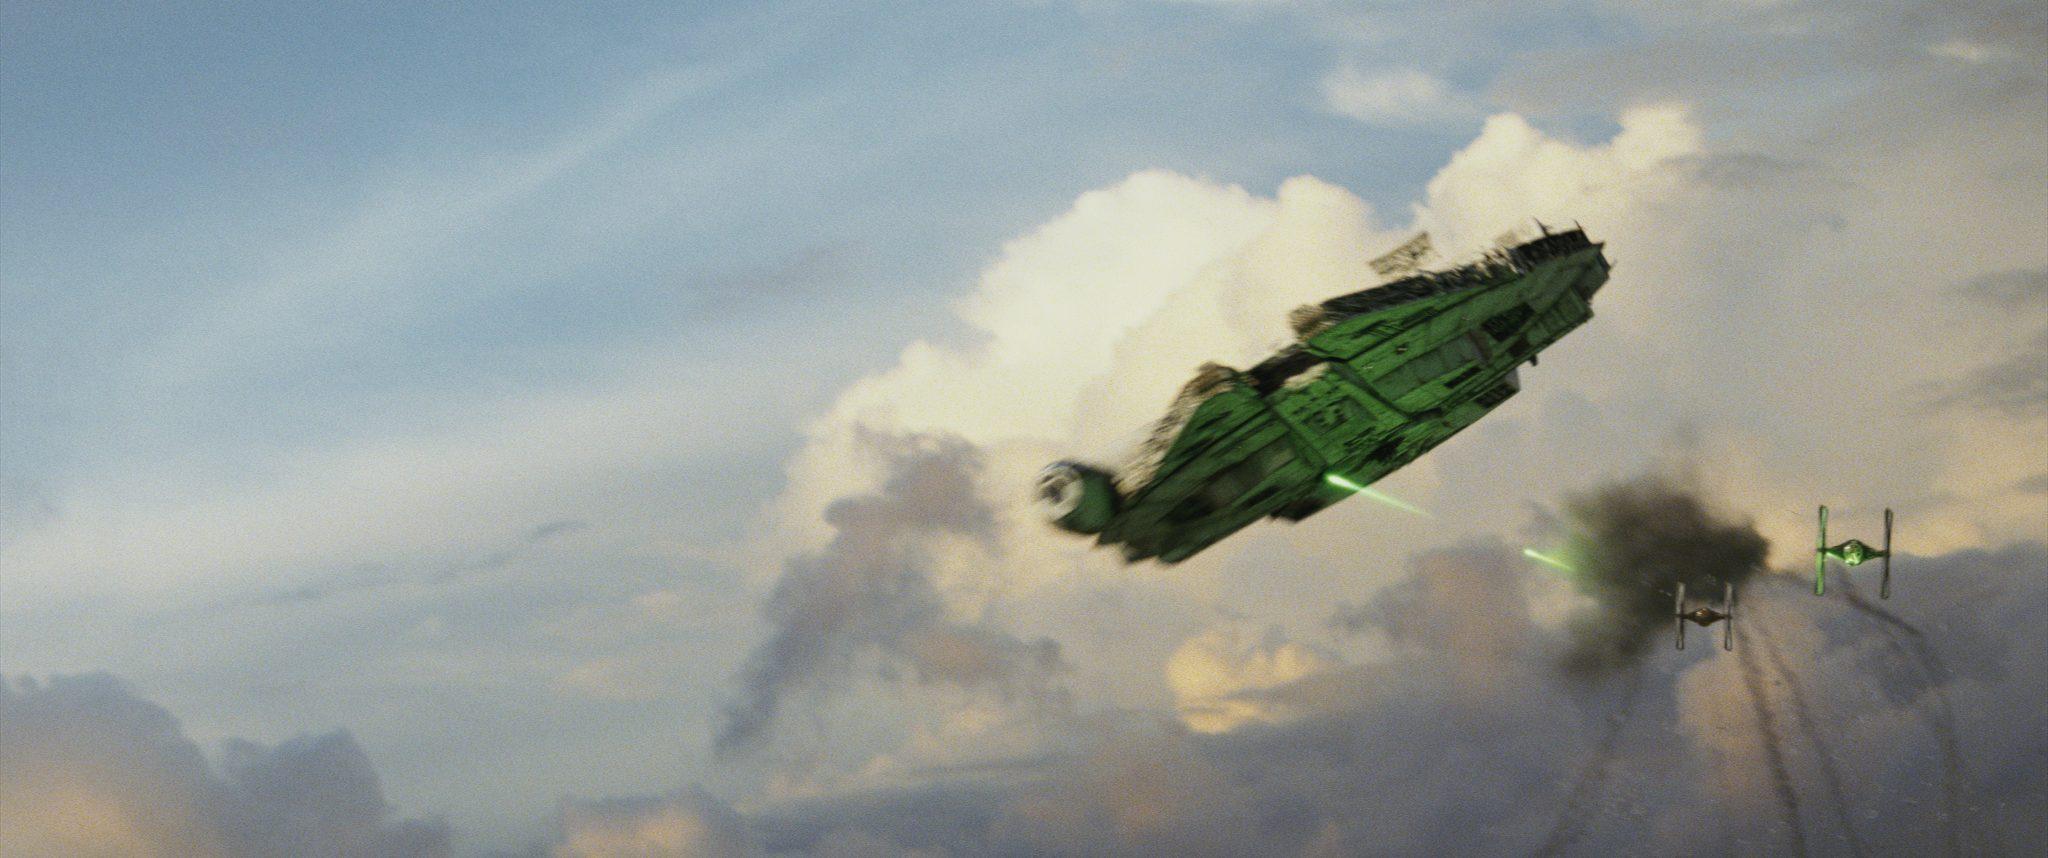 Star Wars : Les Derniers Jedi Falcon Millénium